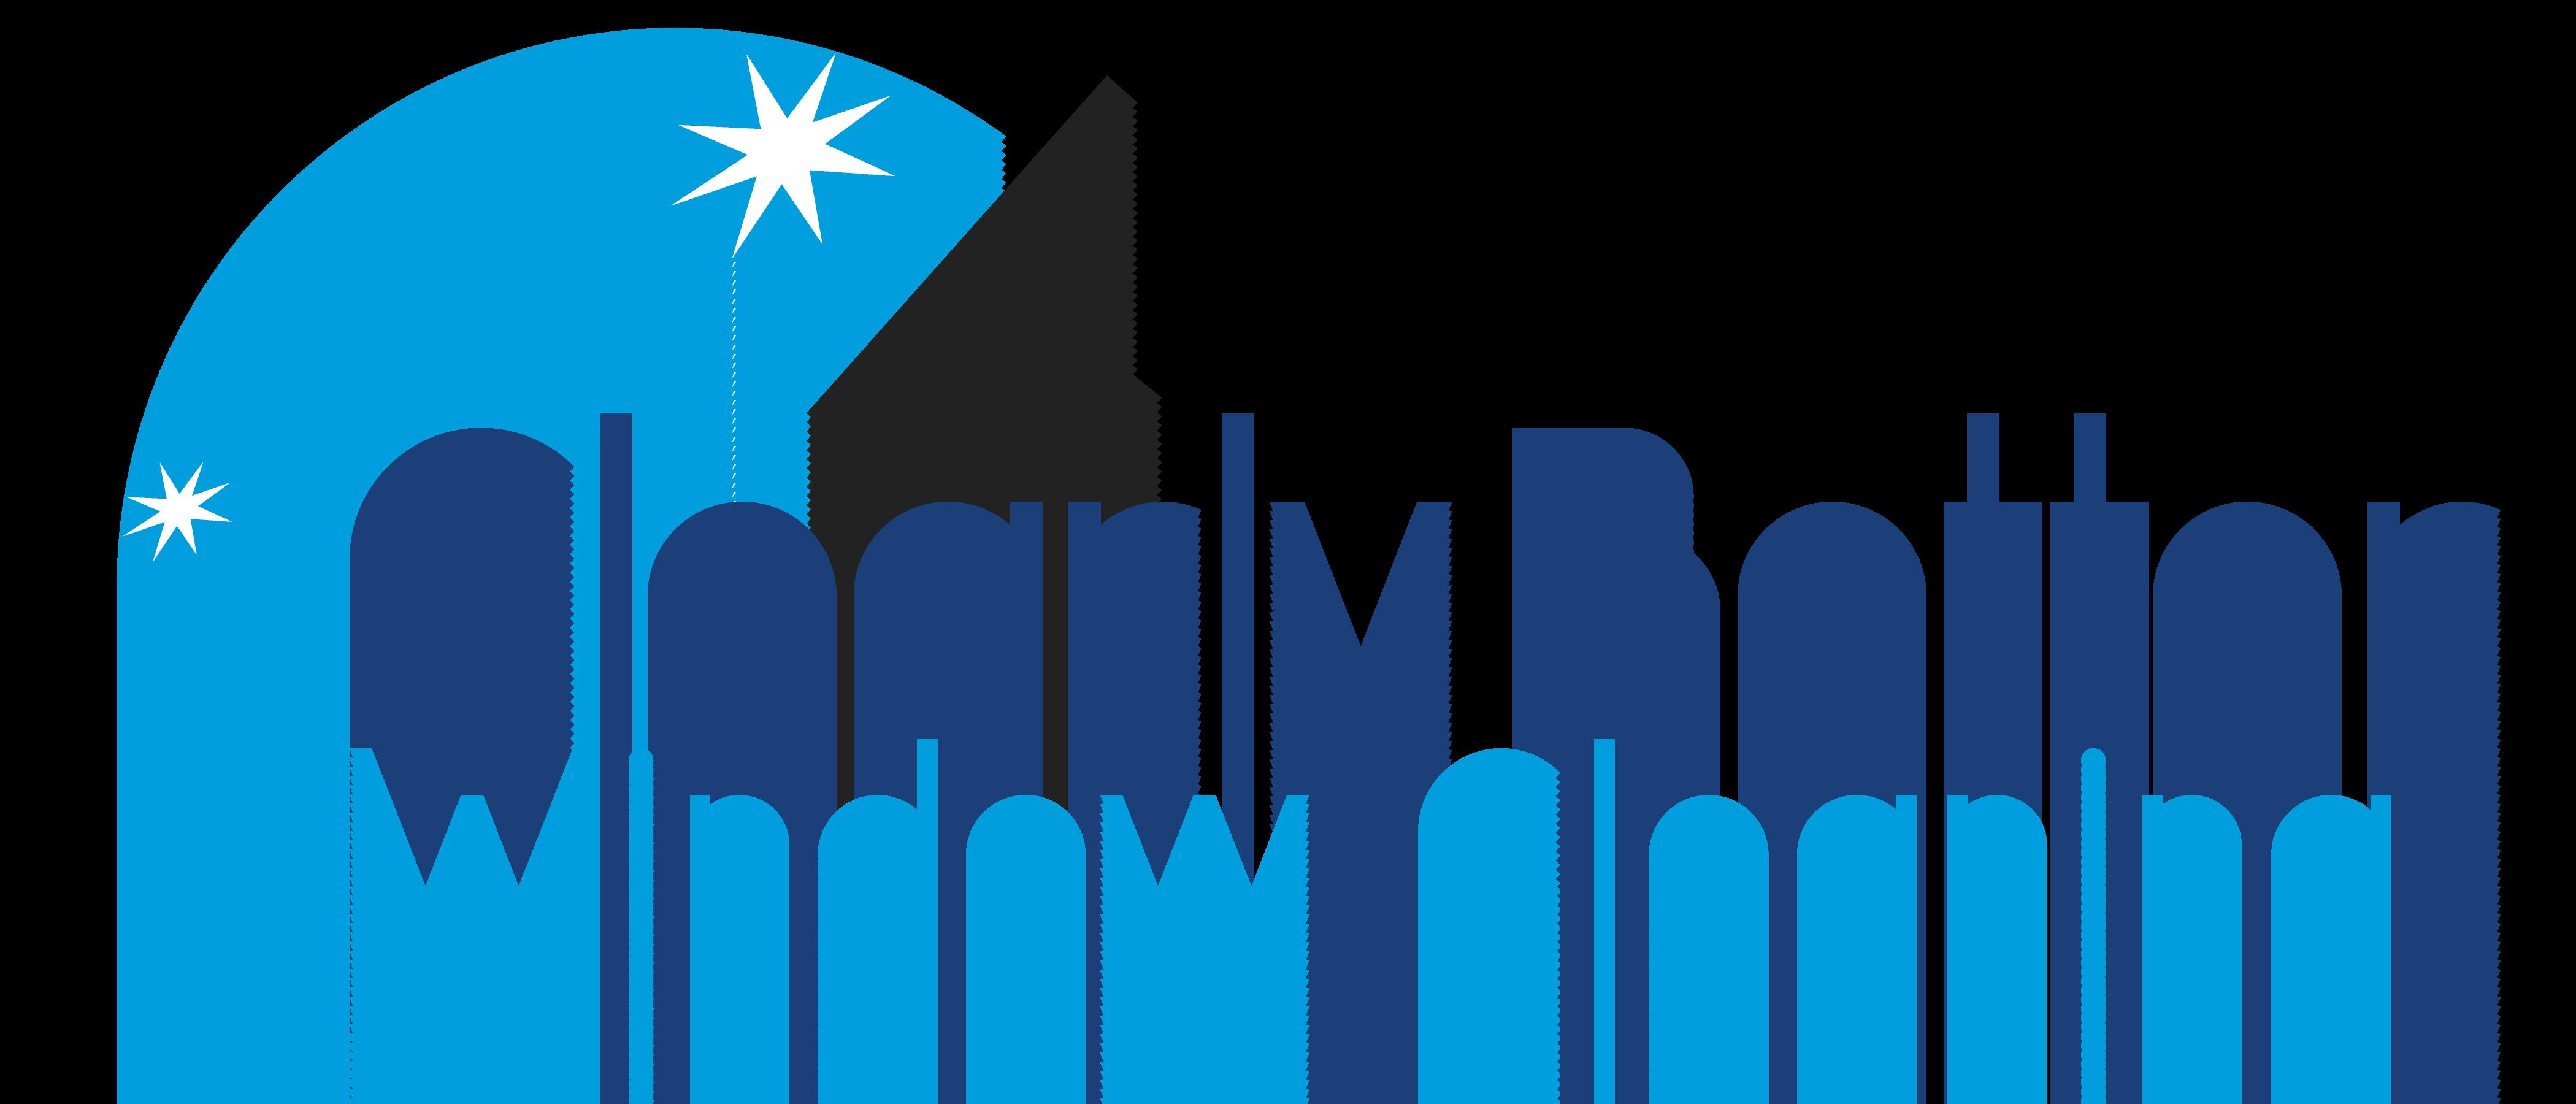 window cleaning logos rh logolynx com window cleaning logos images window cleaning logo images